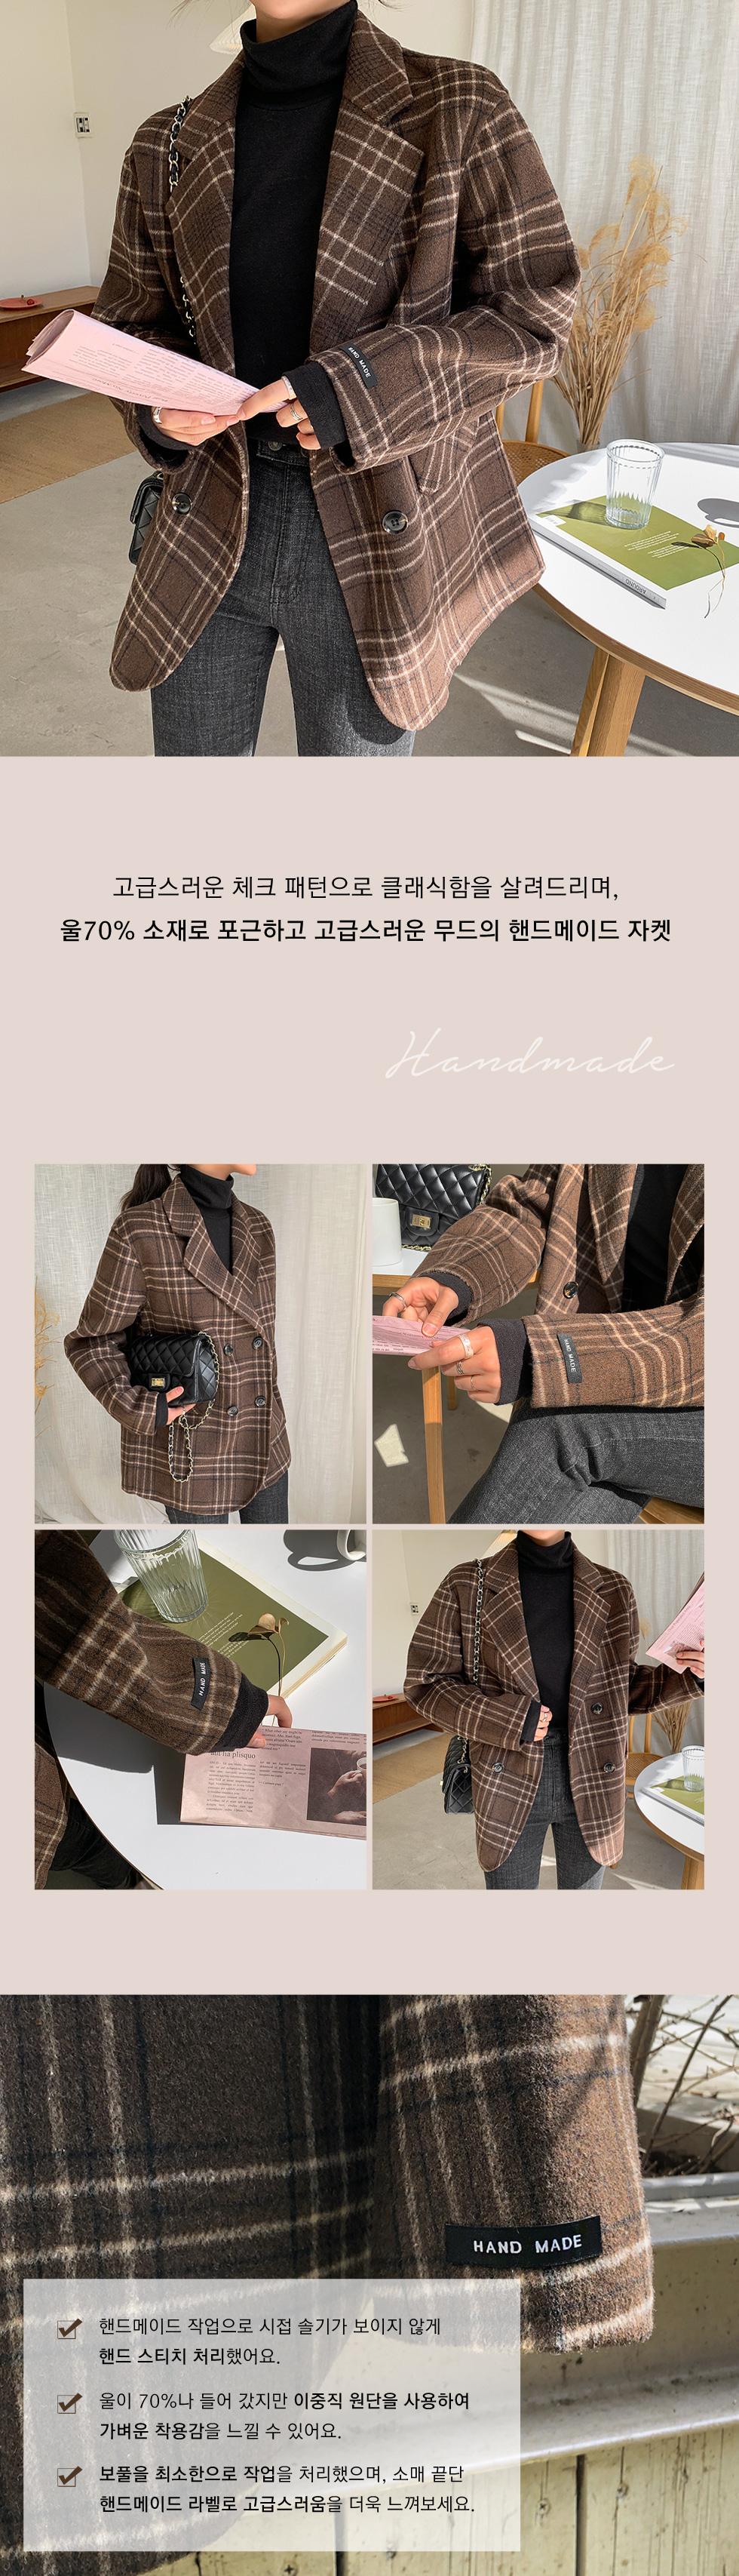 Check Hanme Jacket